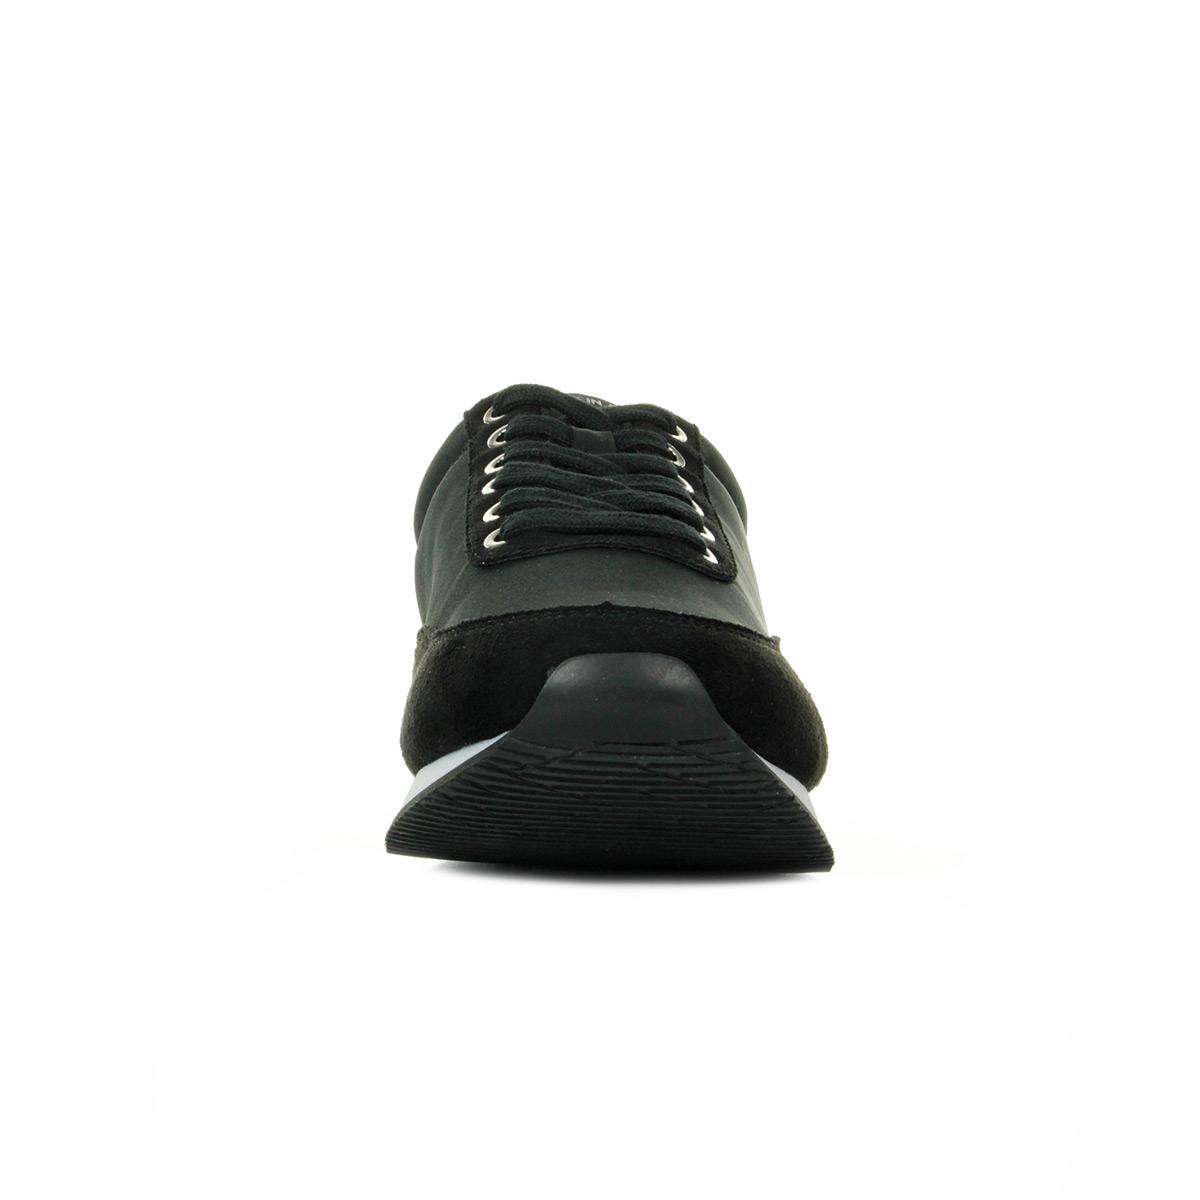 Calvin Klein Tabata Nylon RE9802BLACK, Baskets mode femme 9c4761a700a1